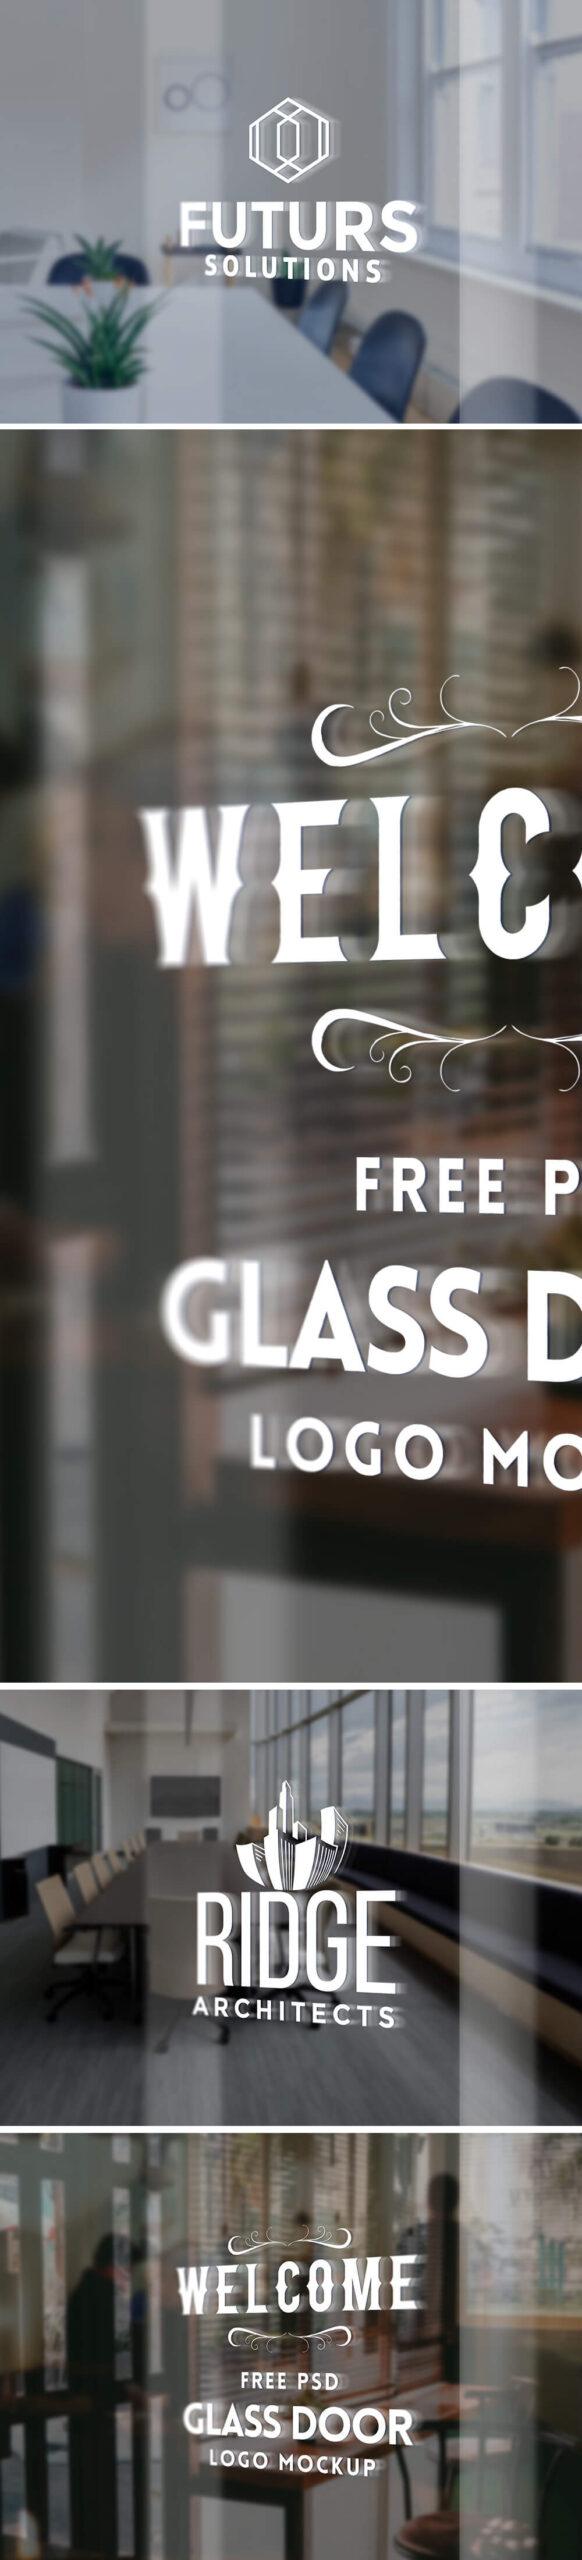 Free Glass Door Logo Mockup PSD Template